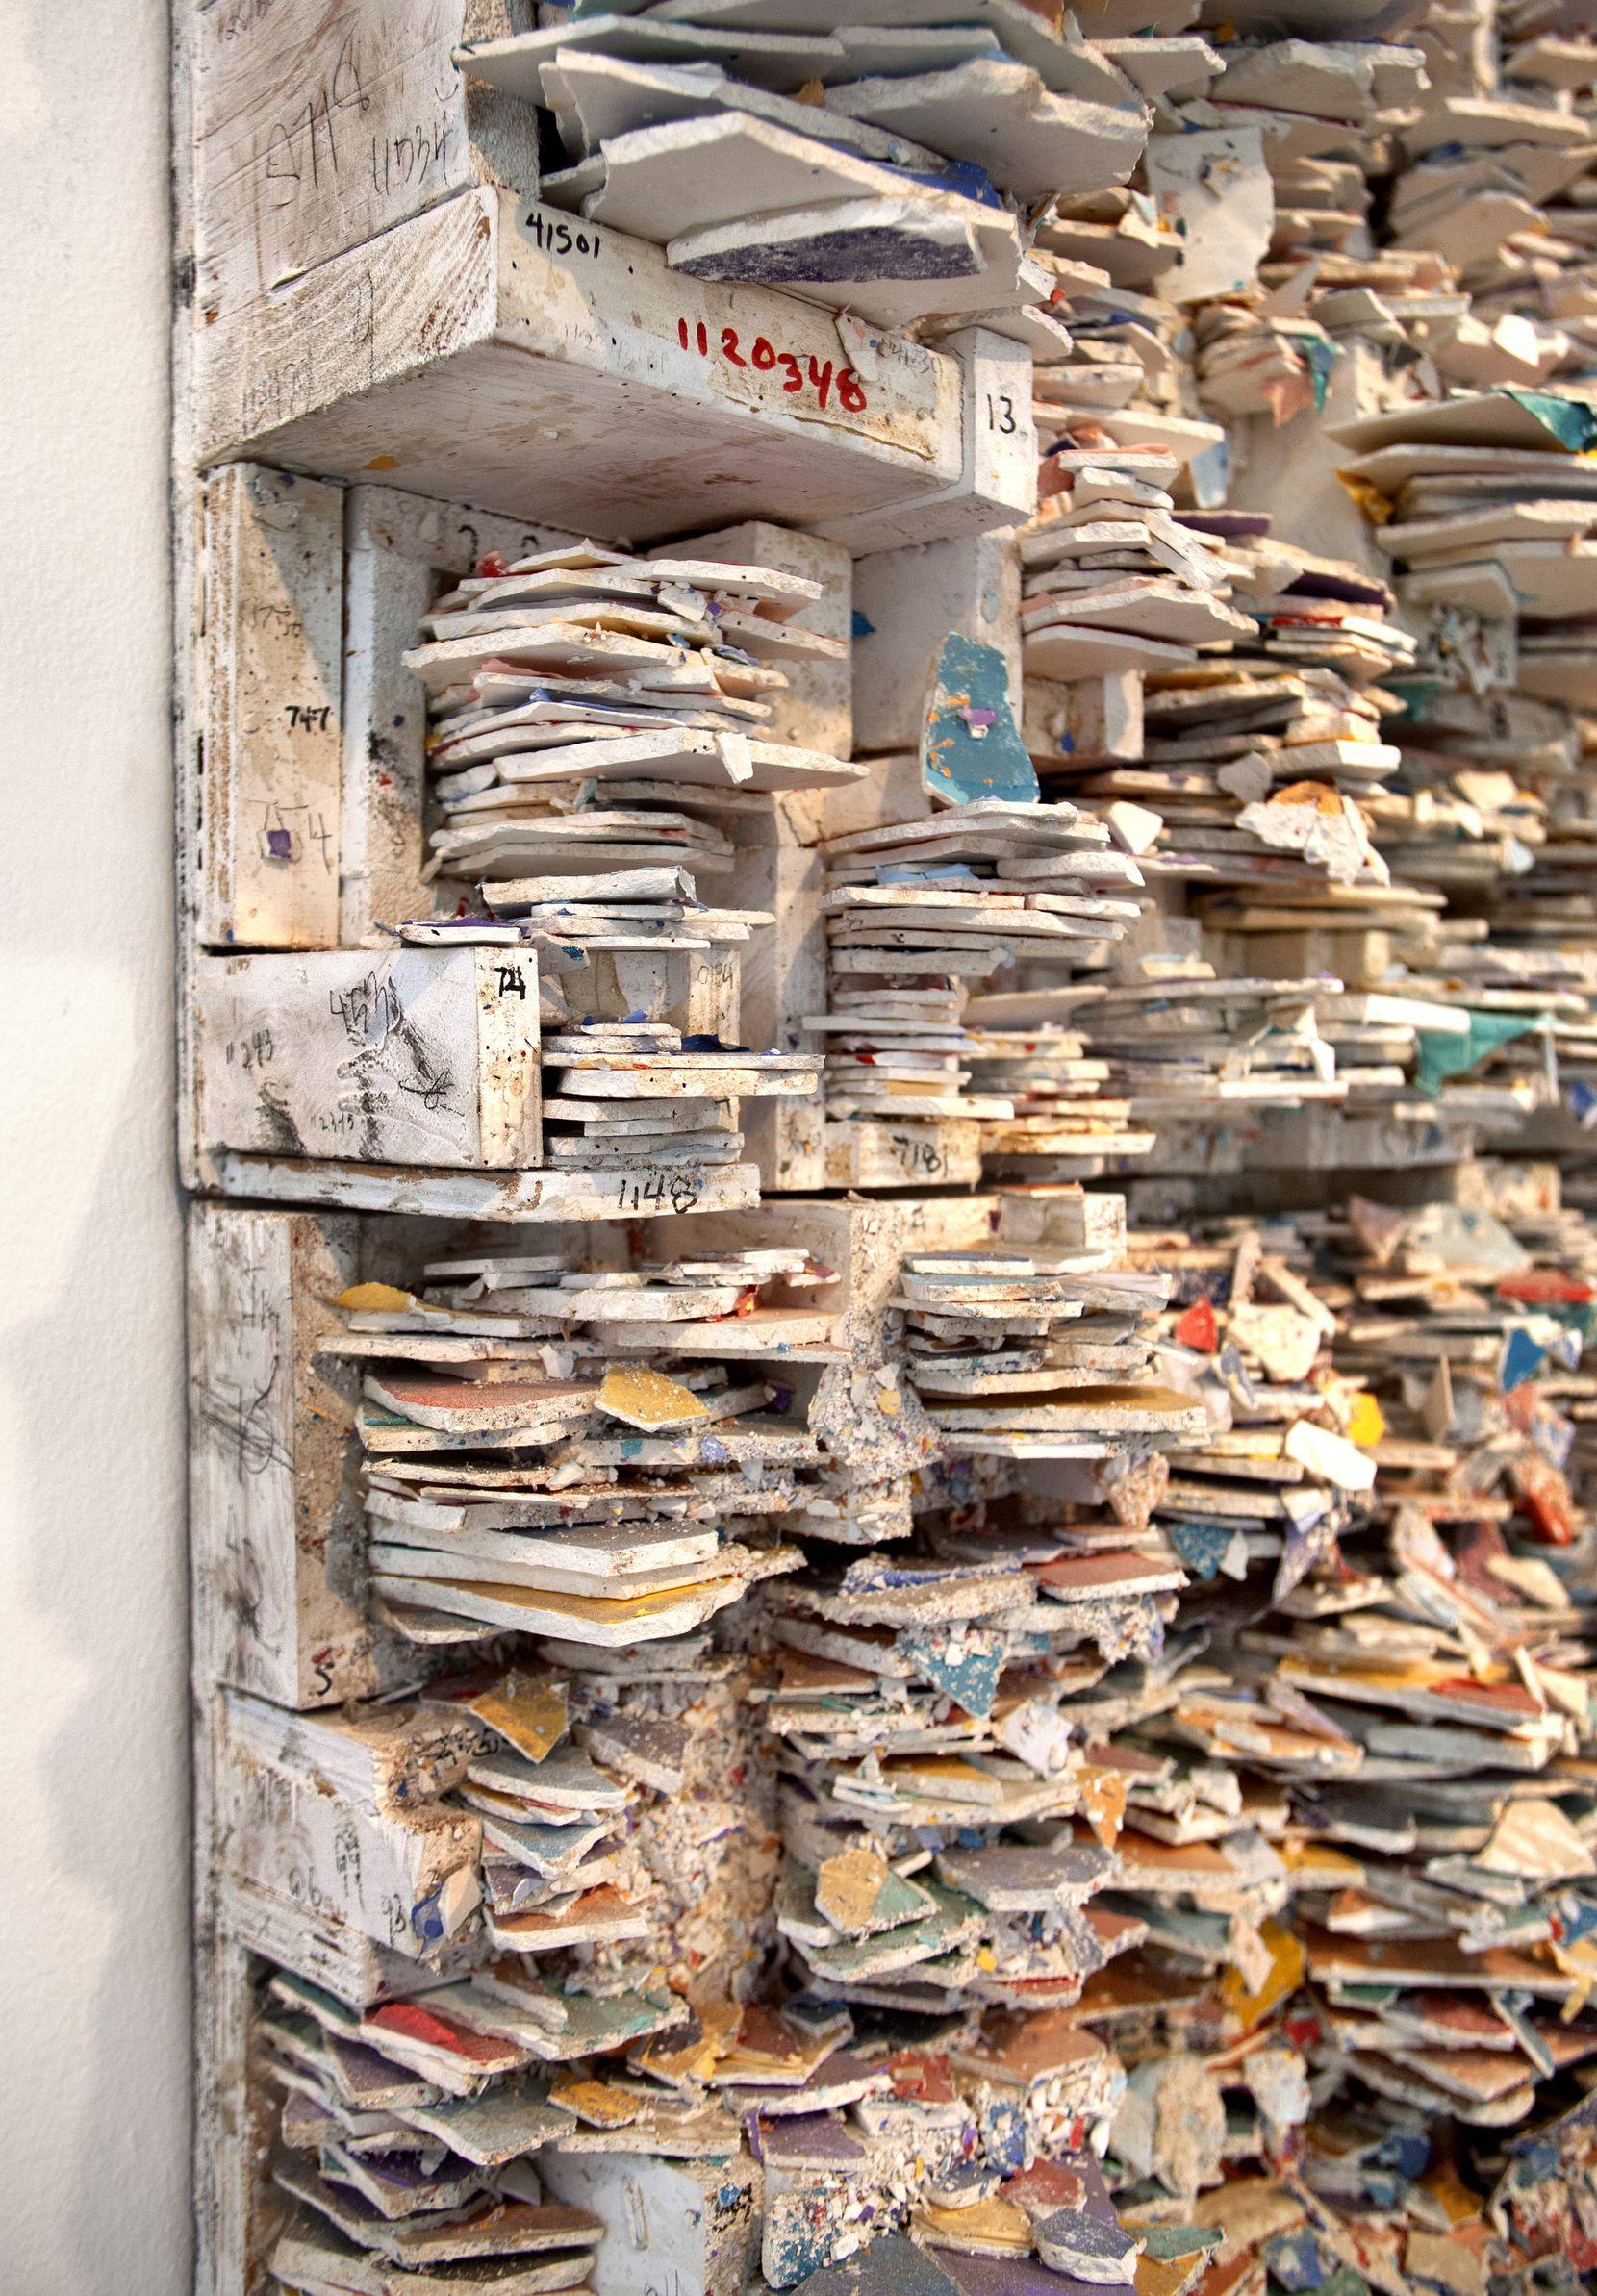 Leonardo Drew, 'Number 196T,' 2019, paint and plaster (detail) at 'Leonardo Drew' at Talley Dunn Gallery through Dec. 15.